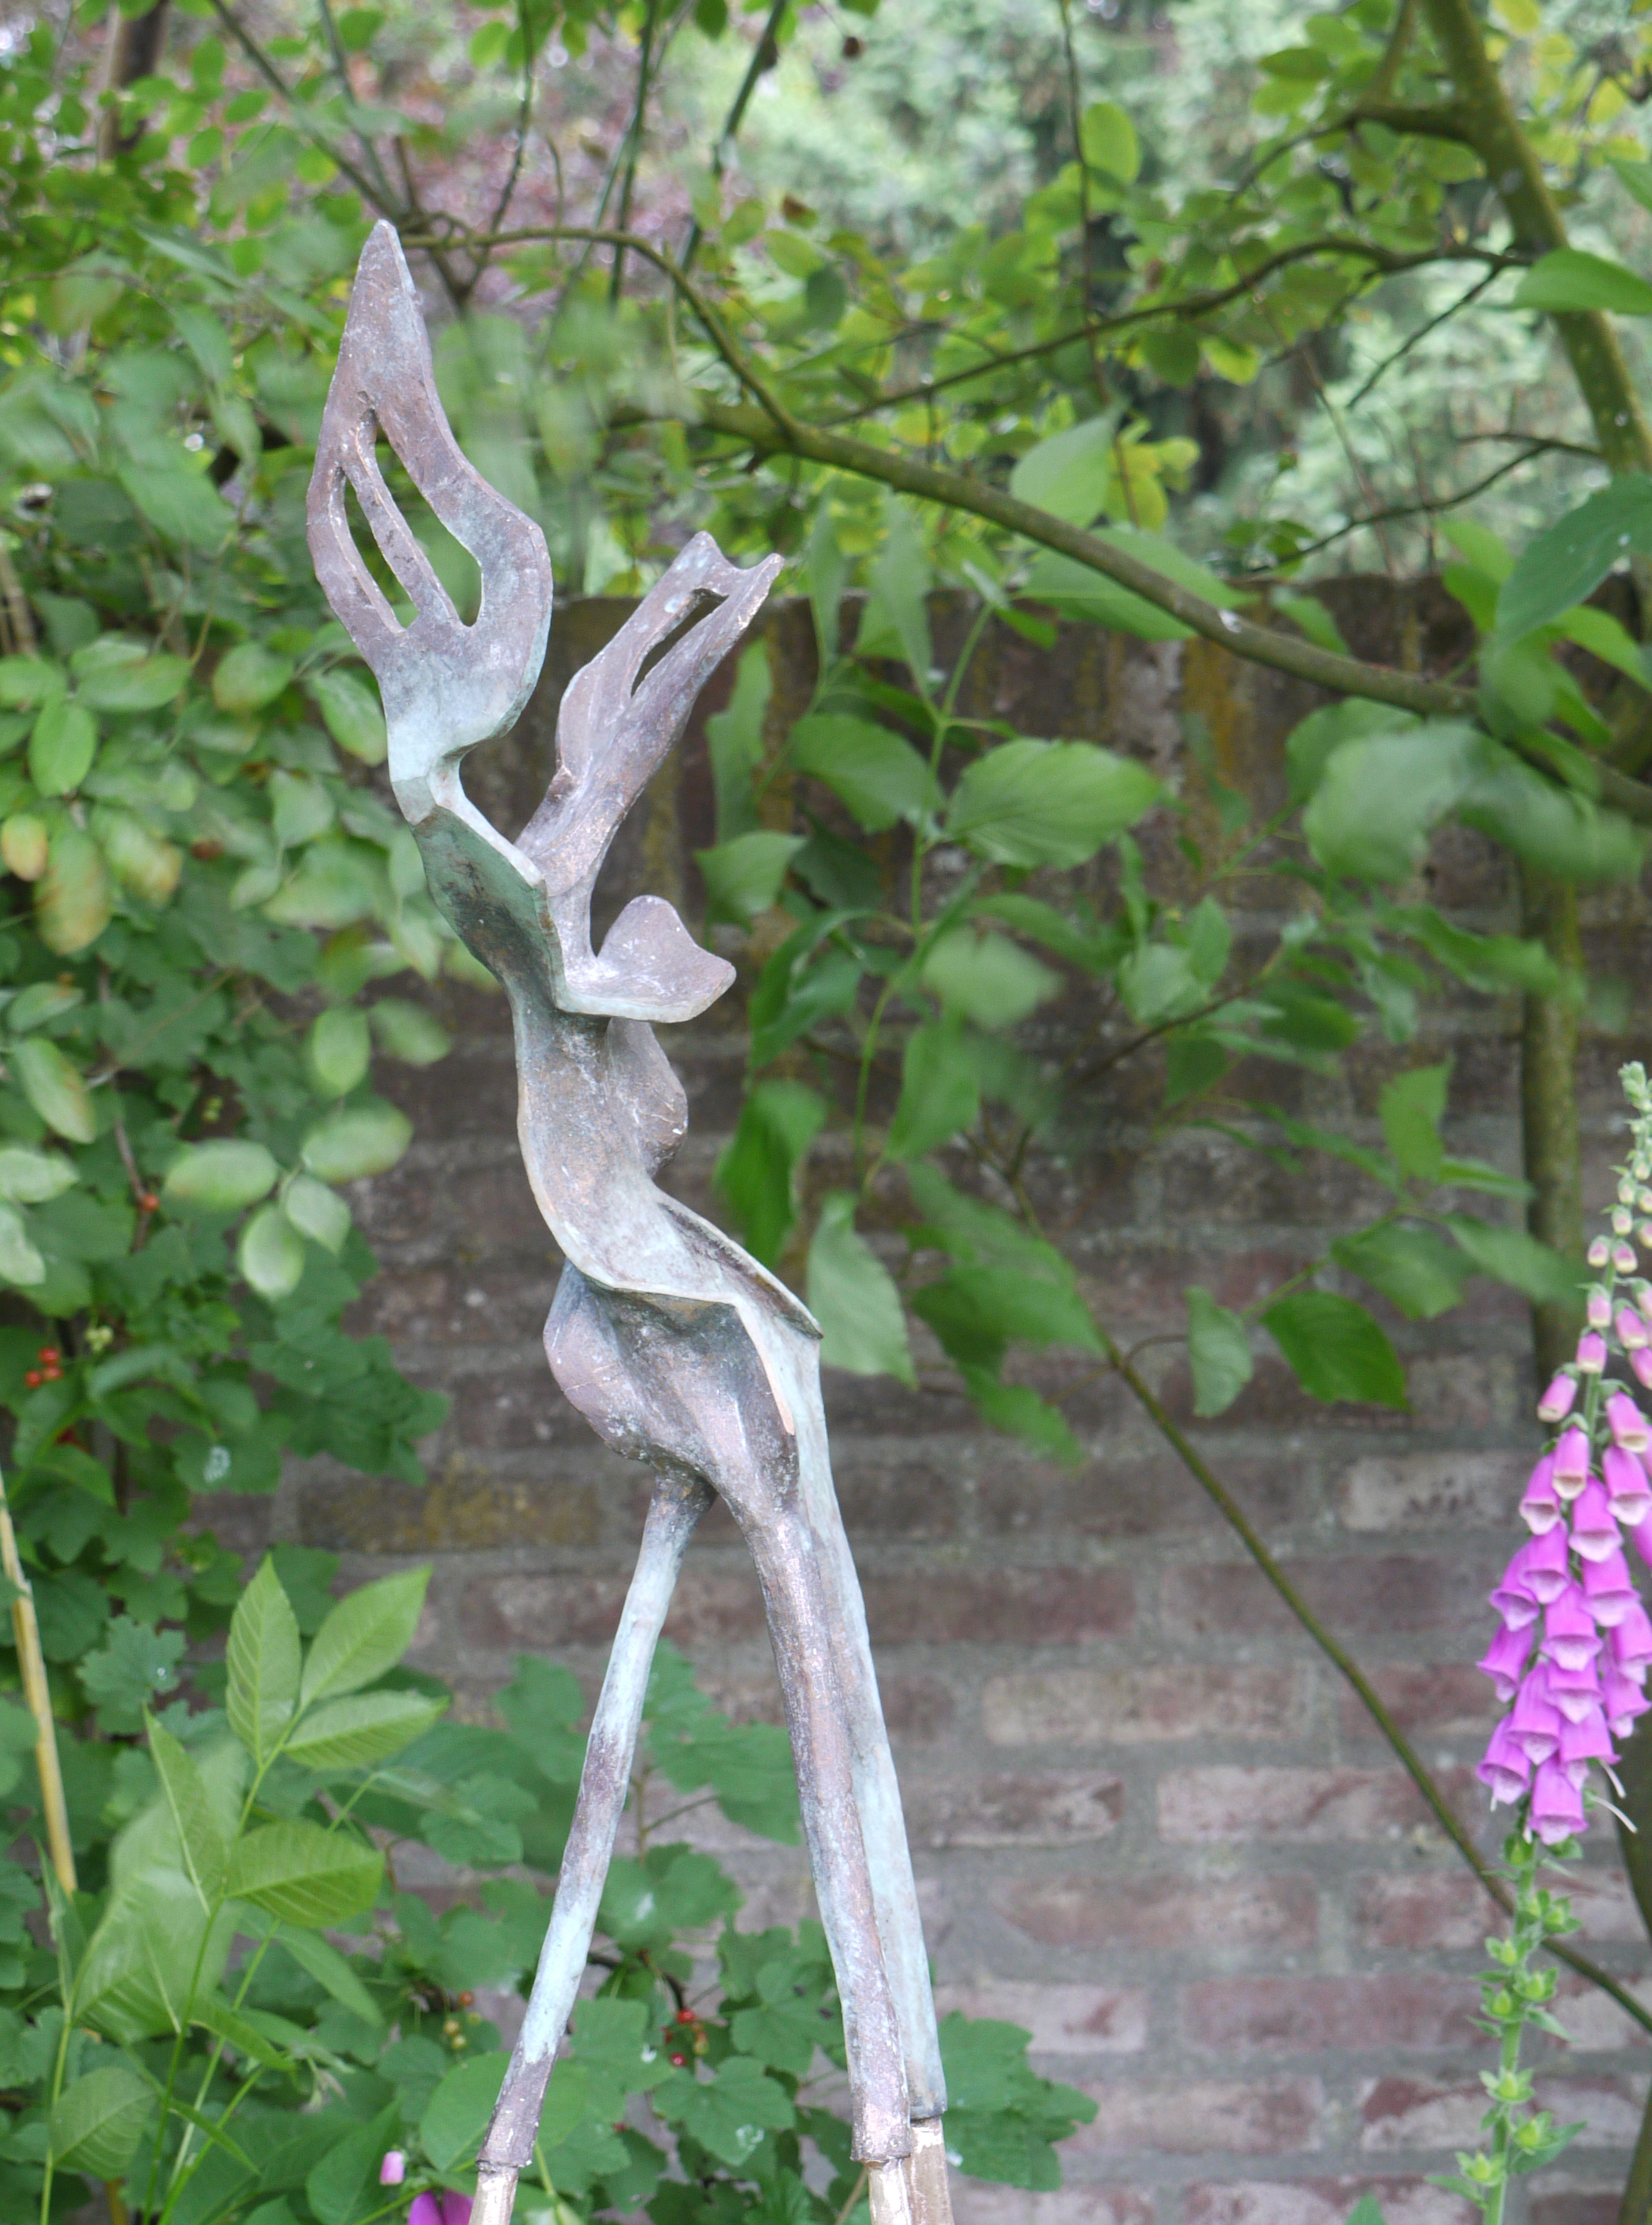 z.t., beeld in brons, hoog 76 cm, 2011